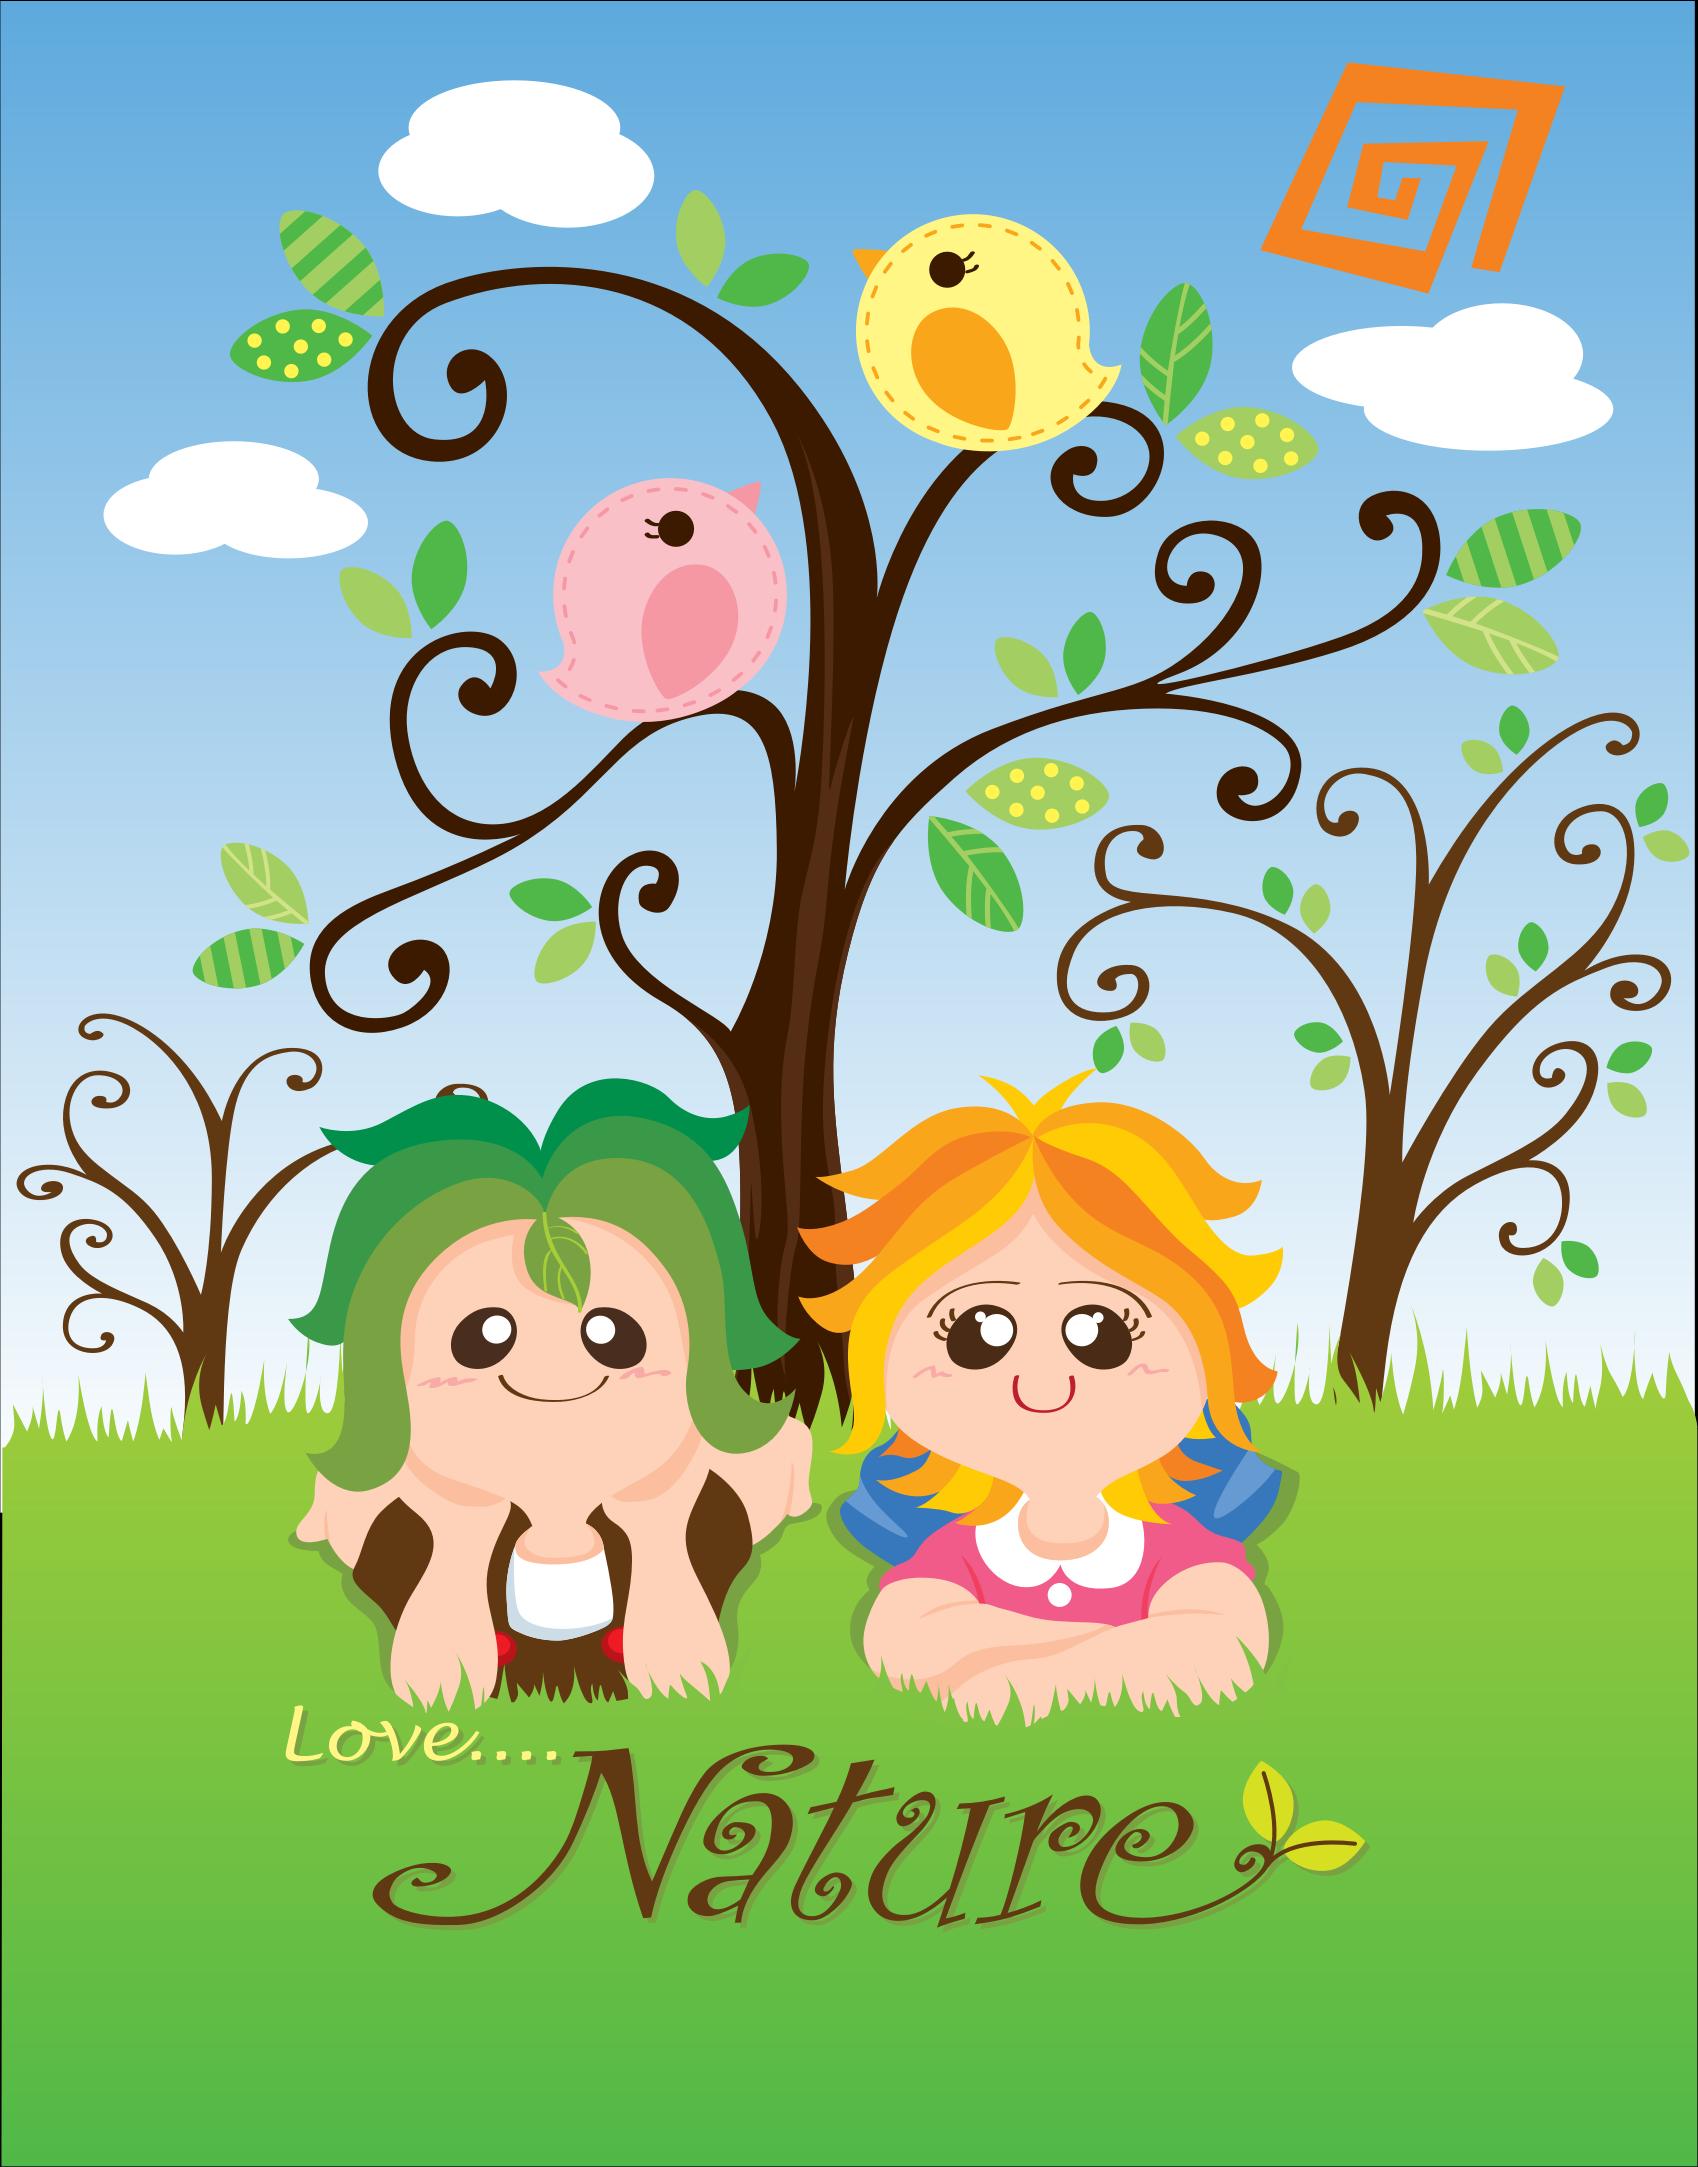 Nature cliparts jpg transparent stock Nature clip art nature images image 3 - Clipartix jpg transparent stock